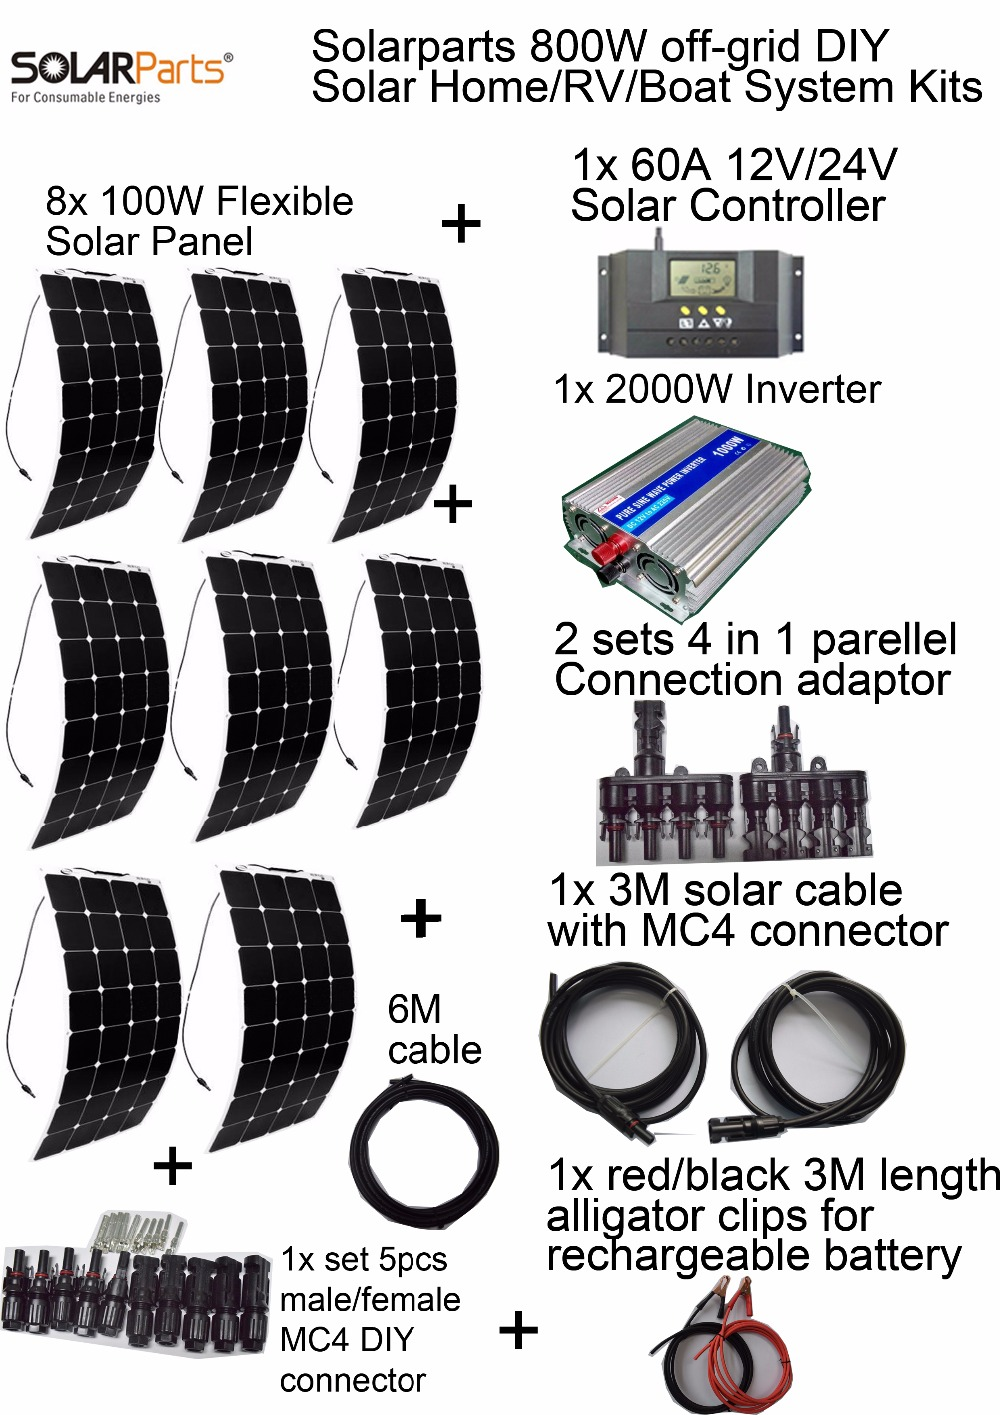 Solarparts off grid Solar System KITS 800W flexible solar